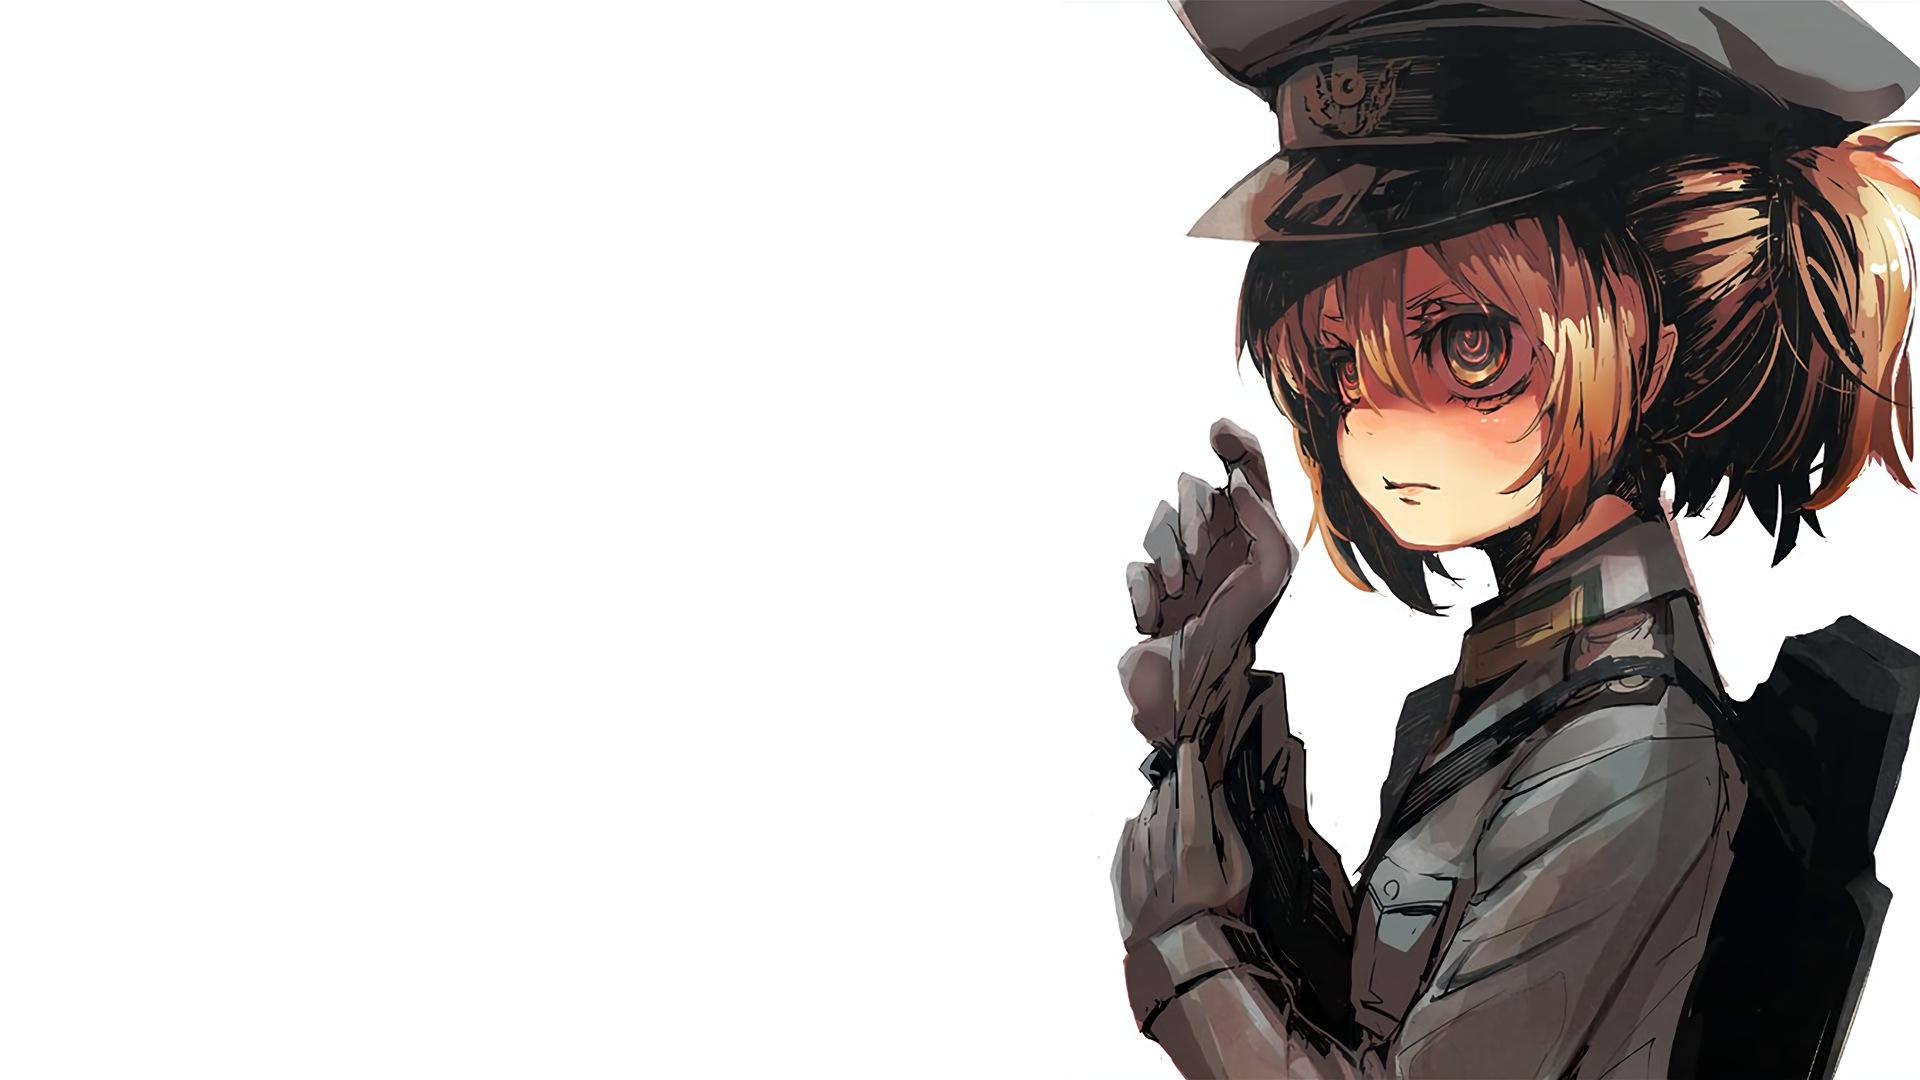 Youjo Senki Anime Tanya Degurechaff Wallpaper 22383 Tanya The Evil 1920x1080 Download Hd Wallpaper Wallpapertip